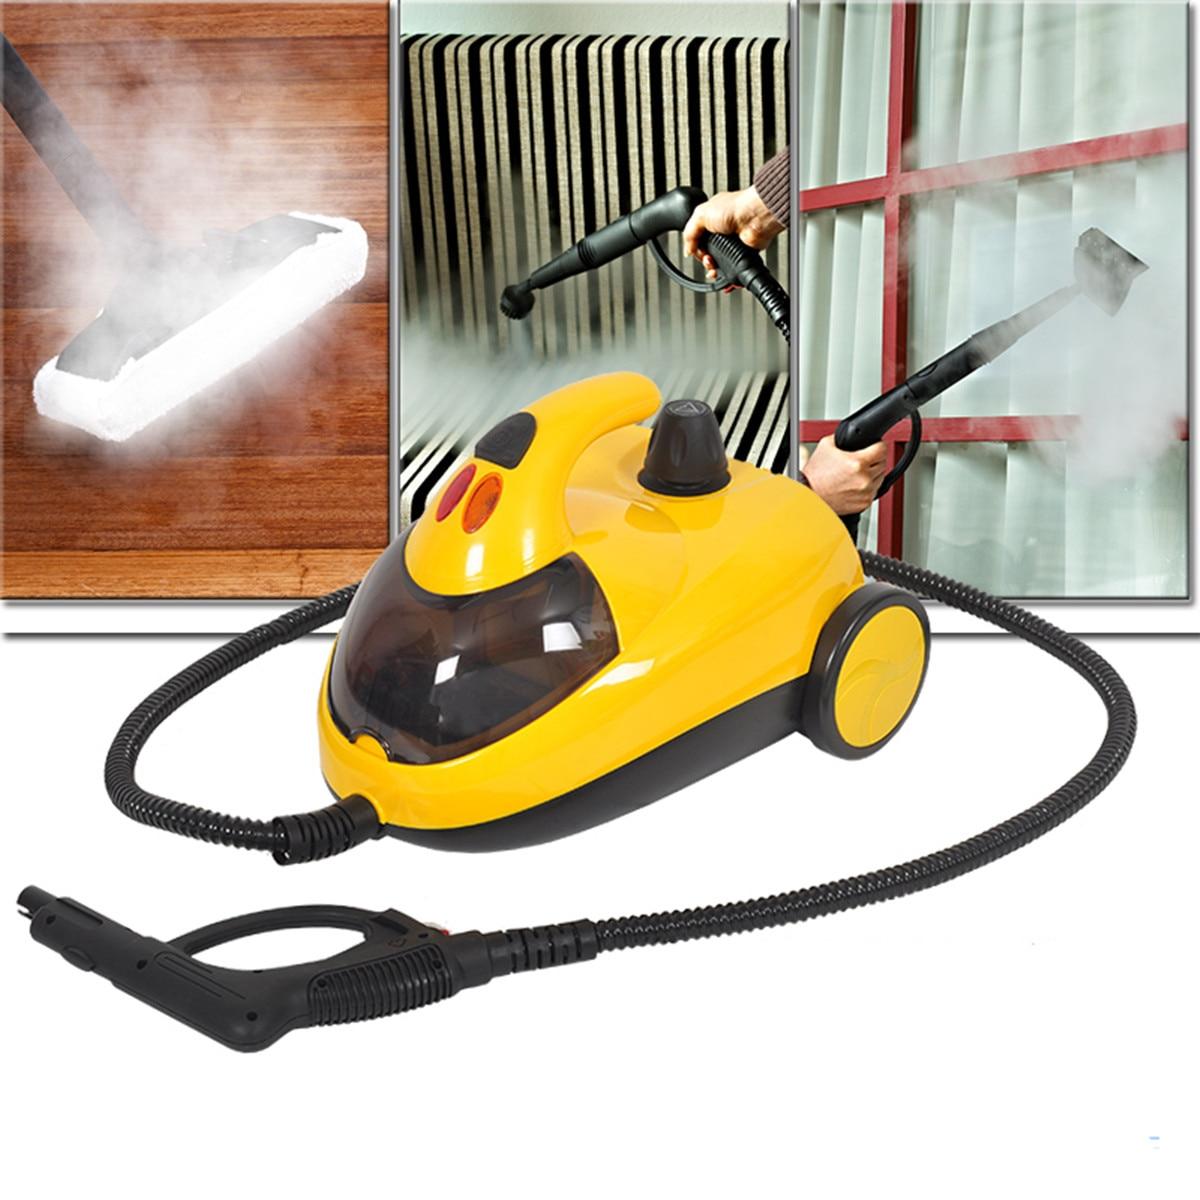 13in1 High Pressure Steam 1800W AU220V 1.5L4.0 Bar Floor Carpet Cleaner Washer Cleaning Machine 360 Wheel for Clean Bathroom Car